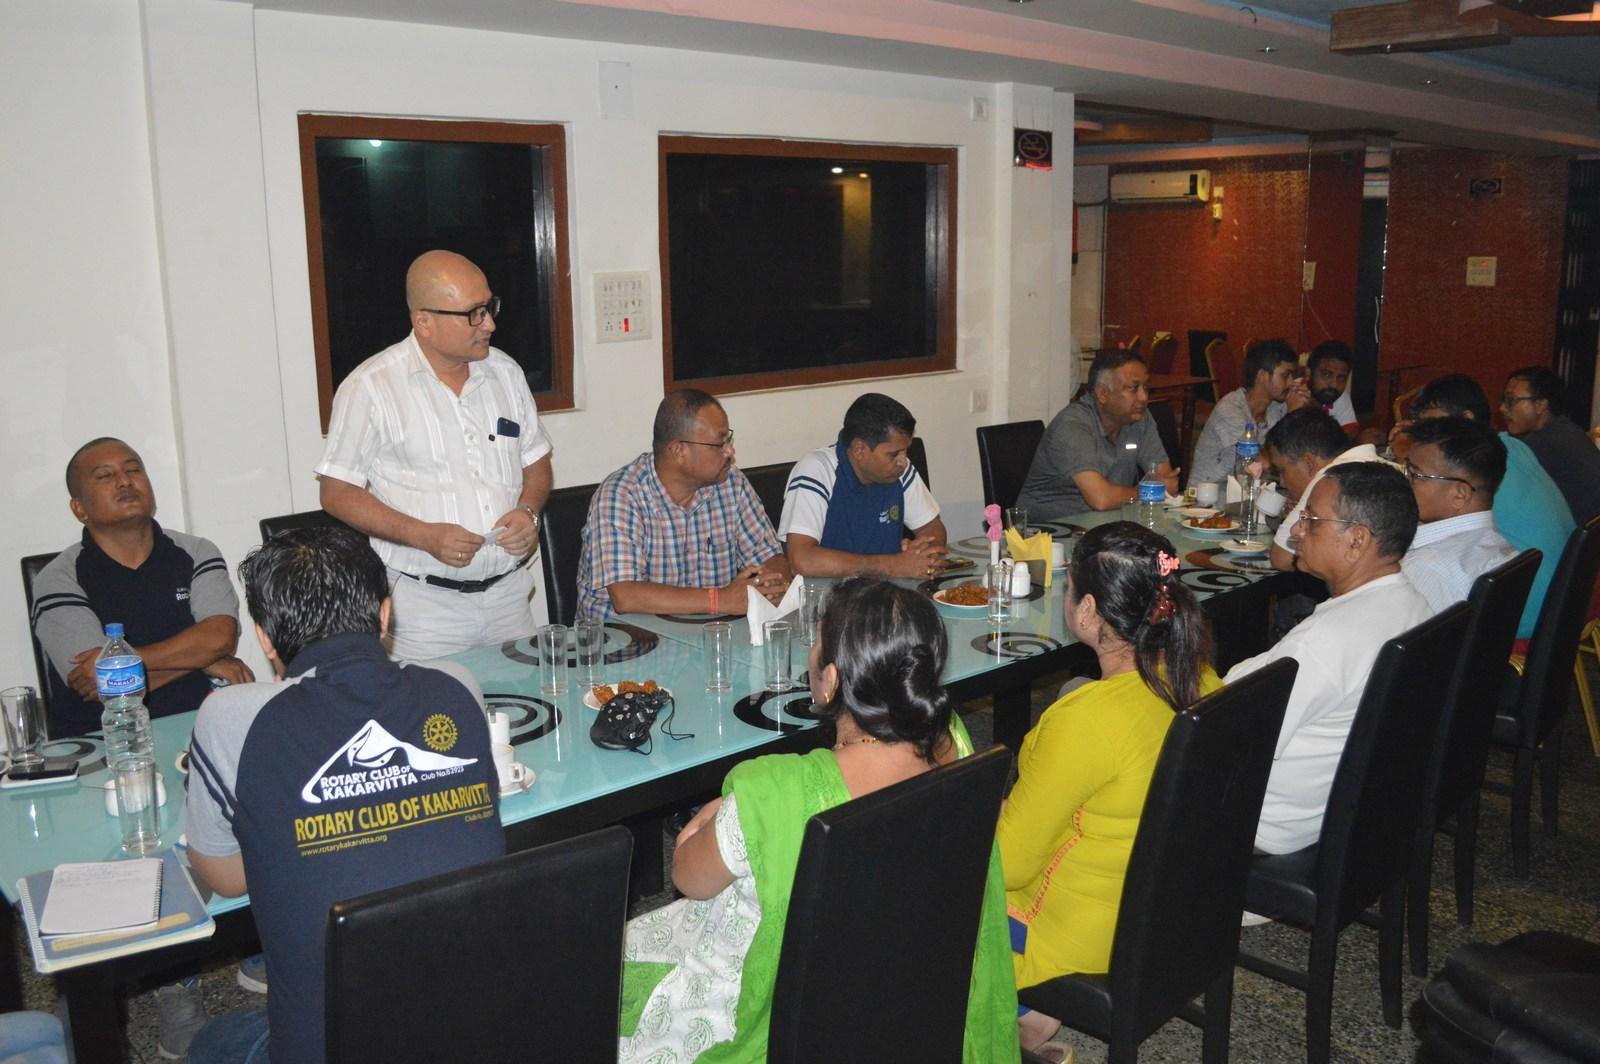 Weekly-Meeting-with-the-Guest-Speaker-DSP-Durga-Raj-Regmi-Rotary-Club-of-Kakarvitta-10